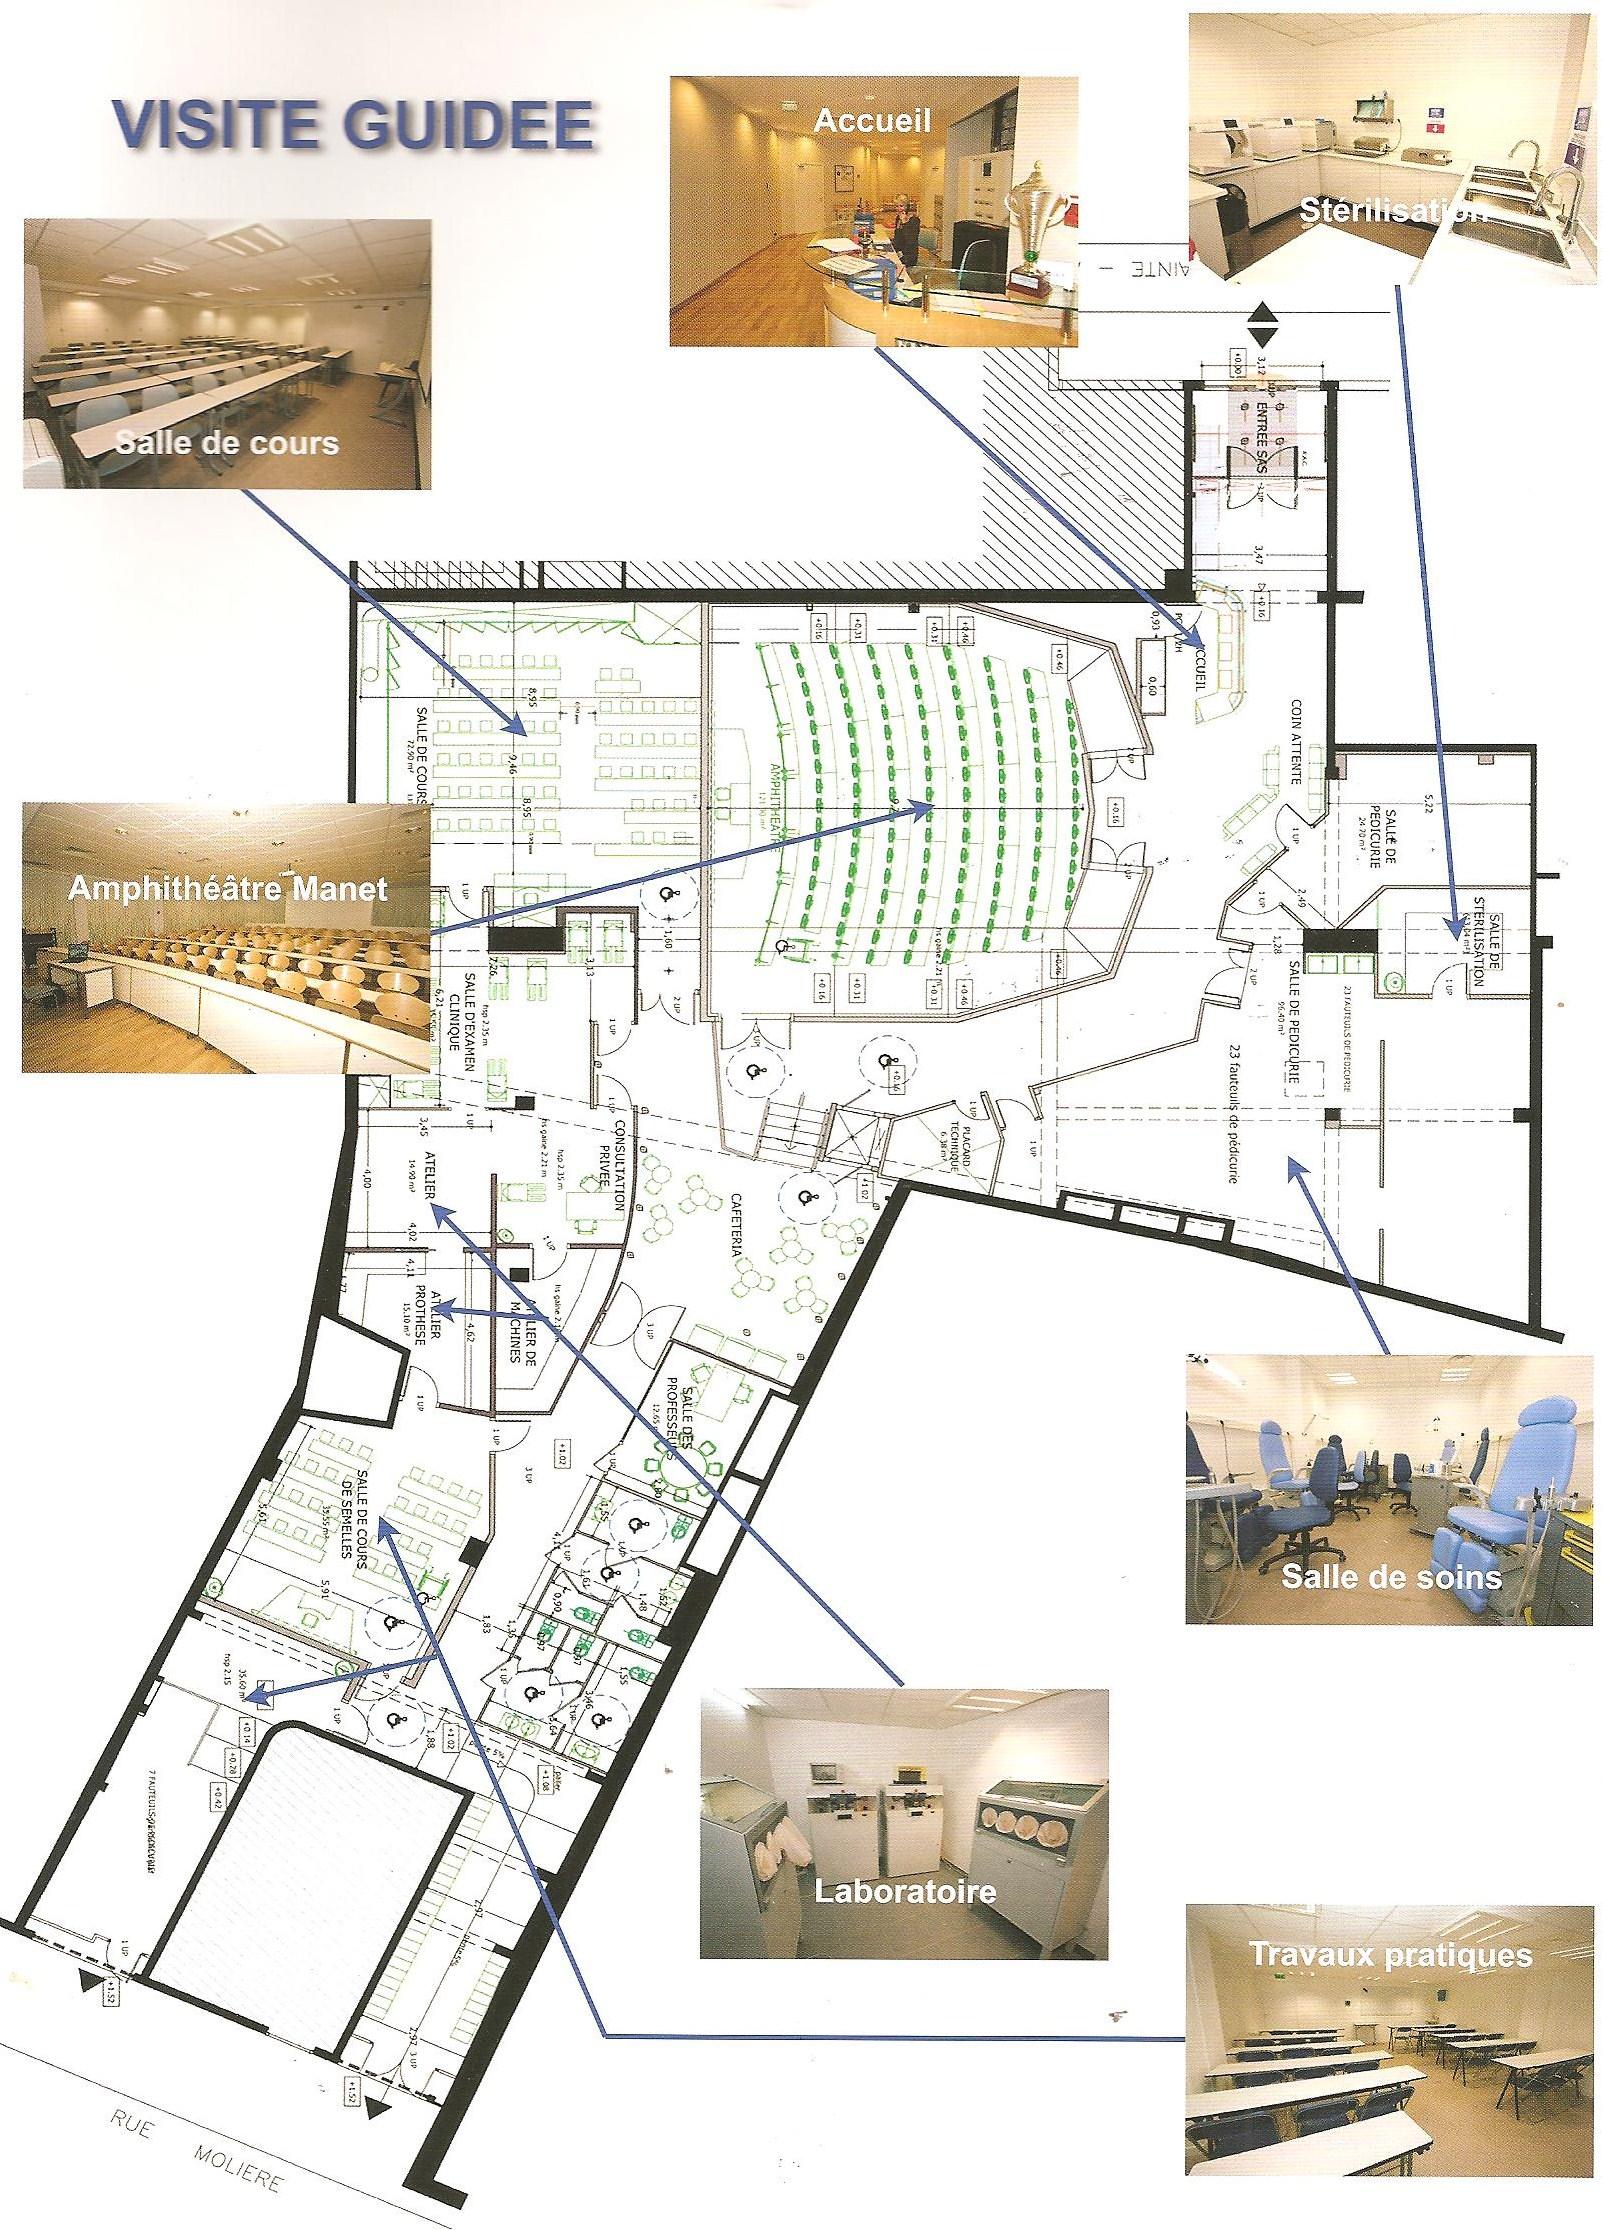 institut national de podologie a c t e s cabinet d 39 architecture. Black Bedroom Furniture Sets. Home Design Ideas